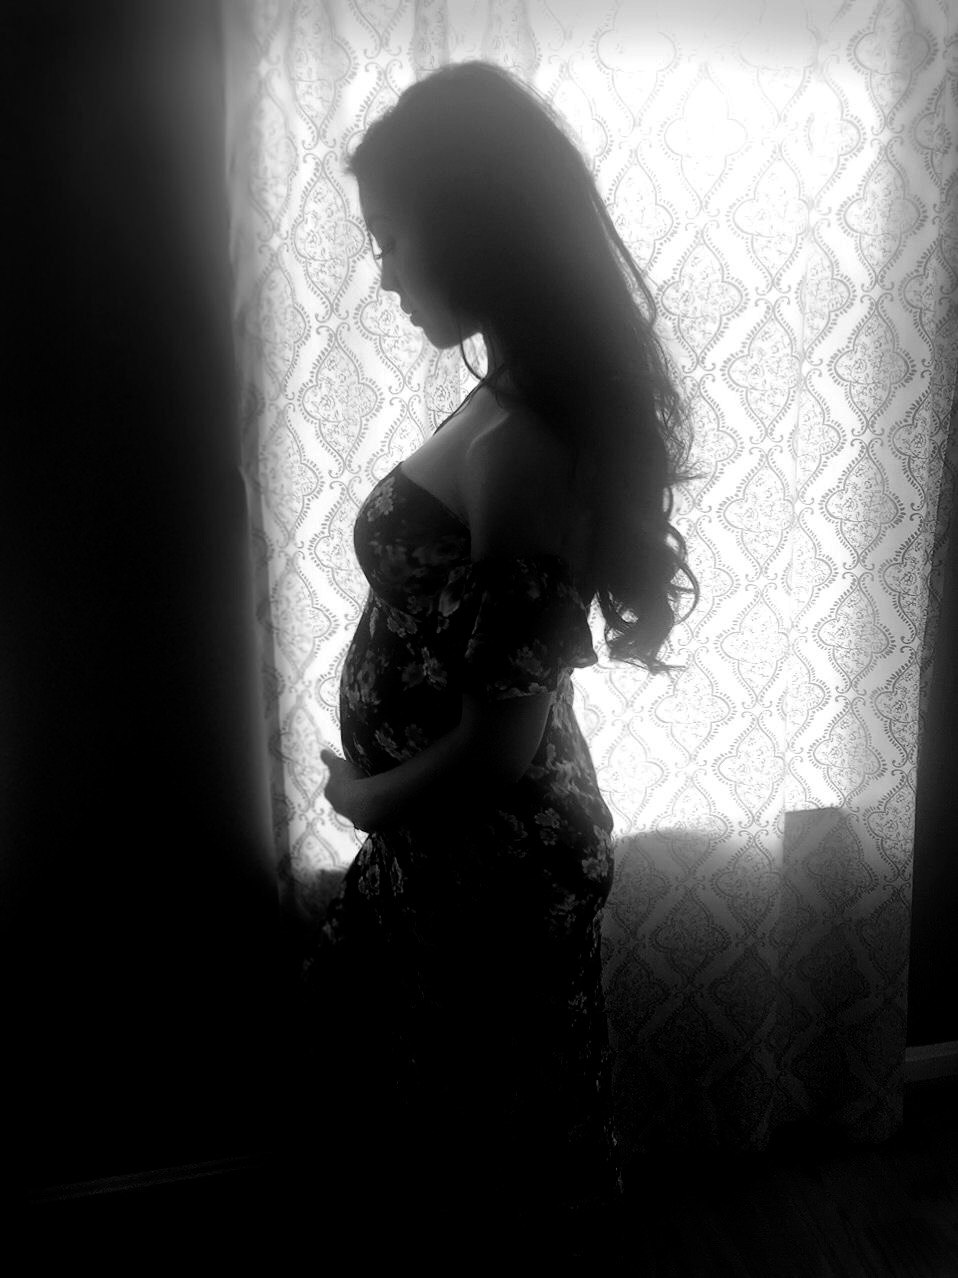 katieladrido-silhouette-pregnancy